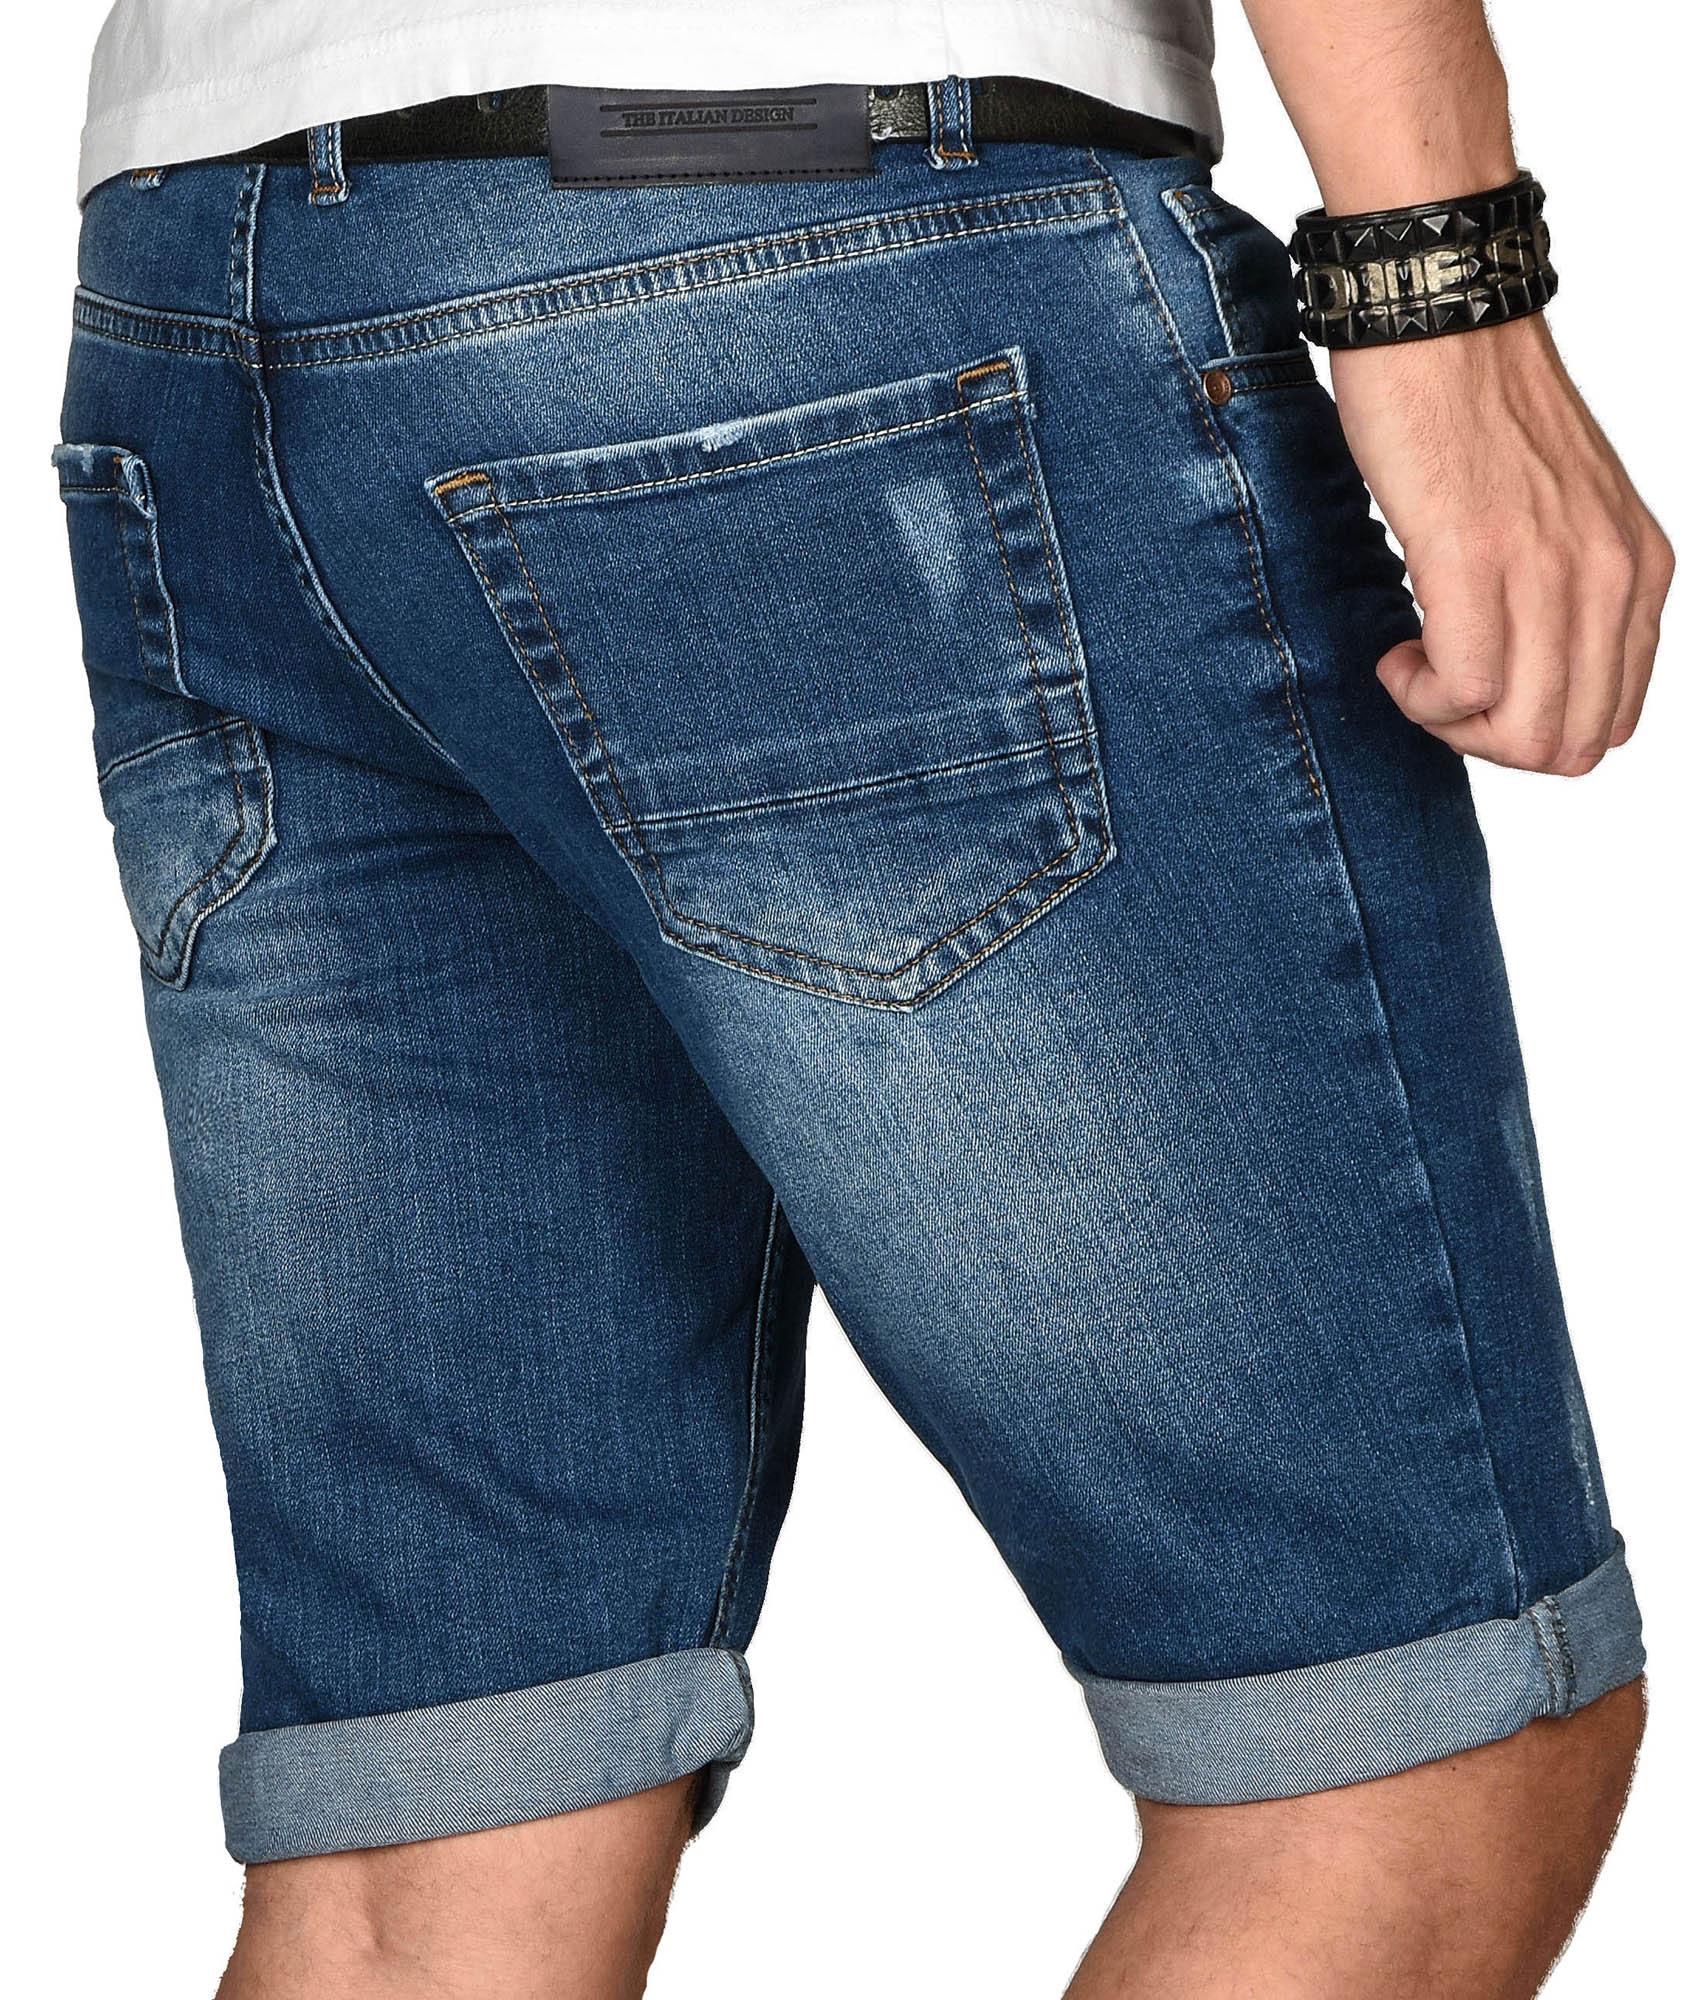 A-Salvarini-Herren-Designer-Jeans-Short-kurze-Hose-Slim-Sommer-Shorts-Bermuda Indexbild 22